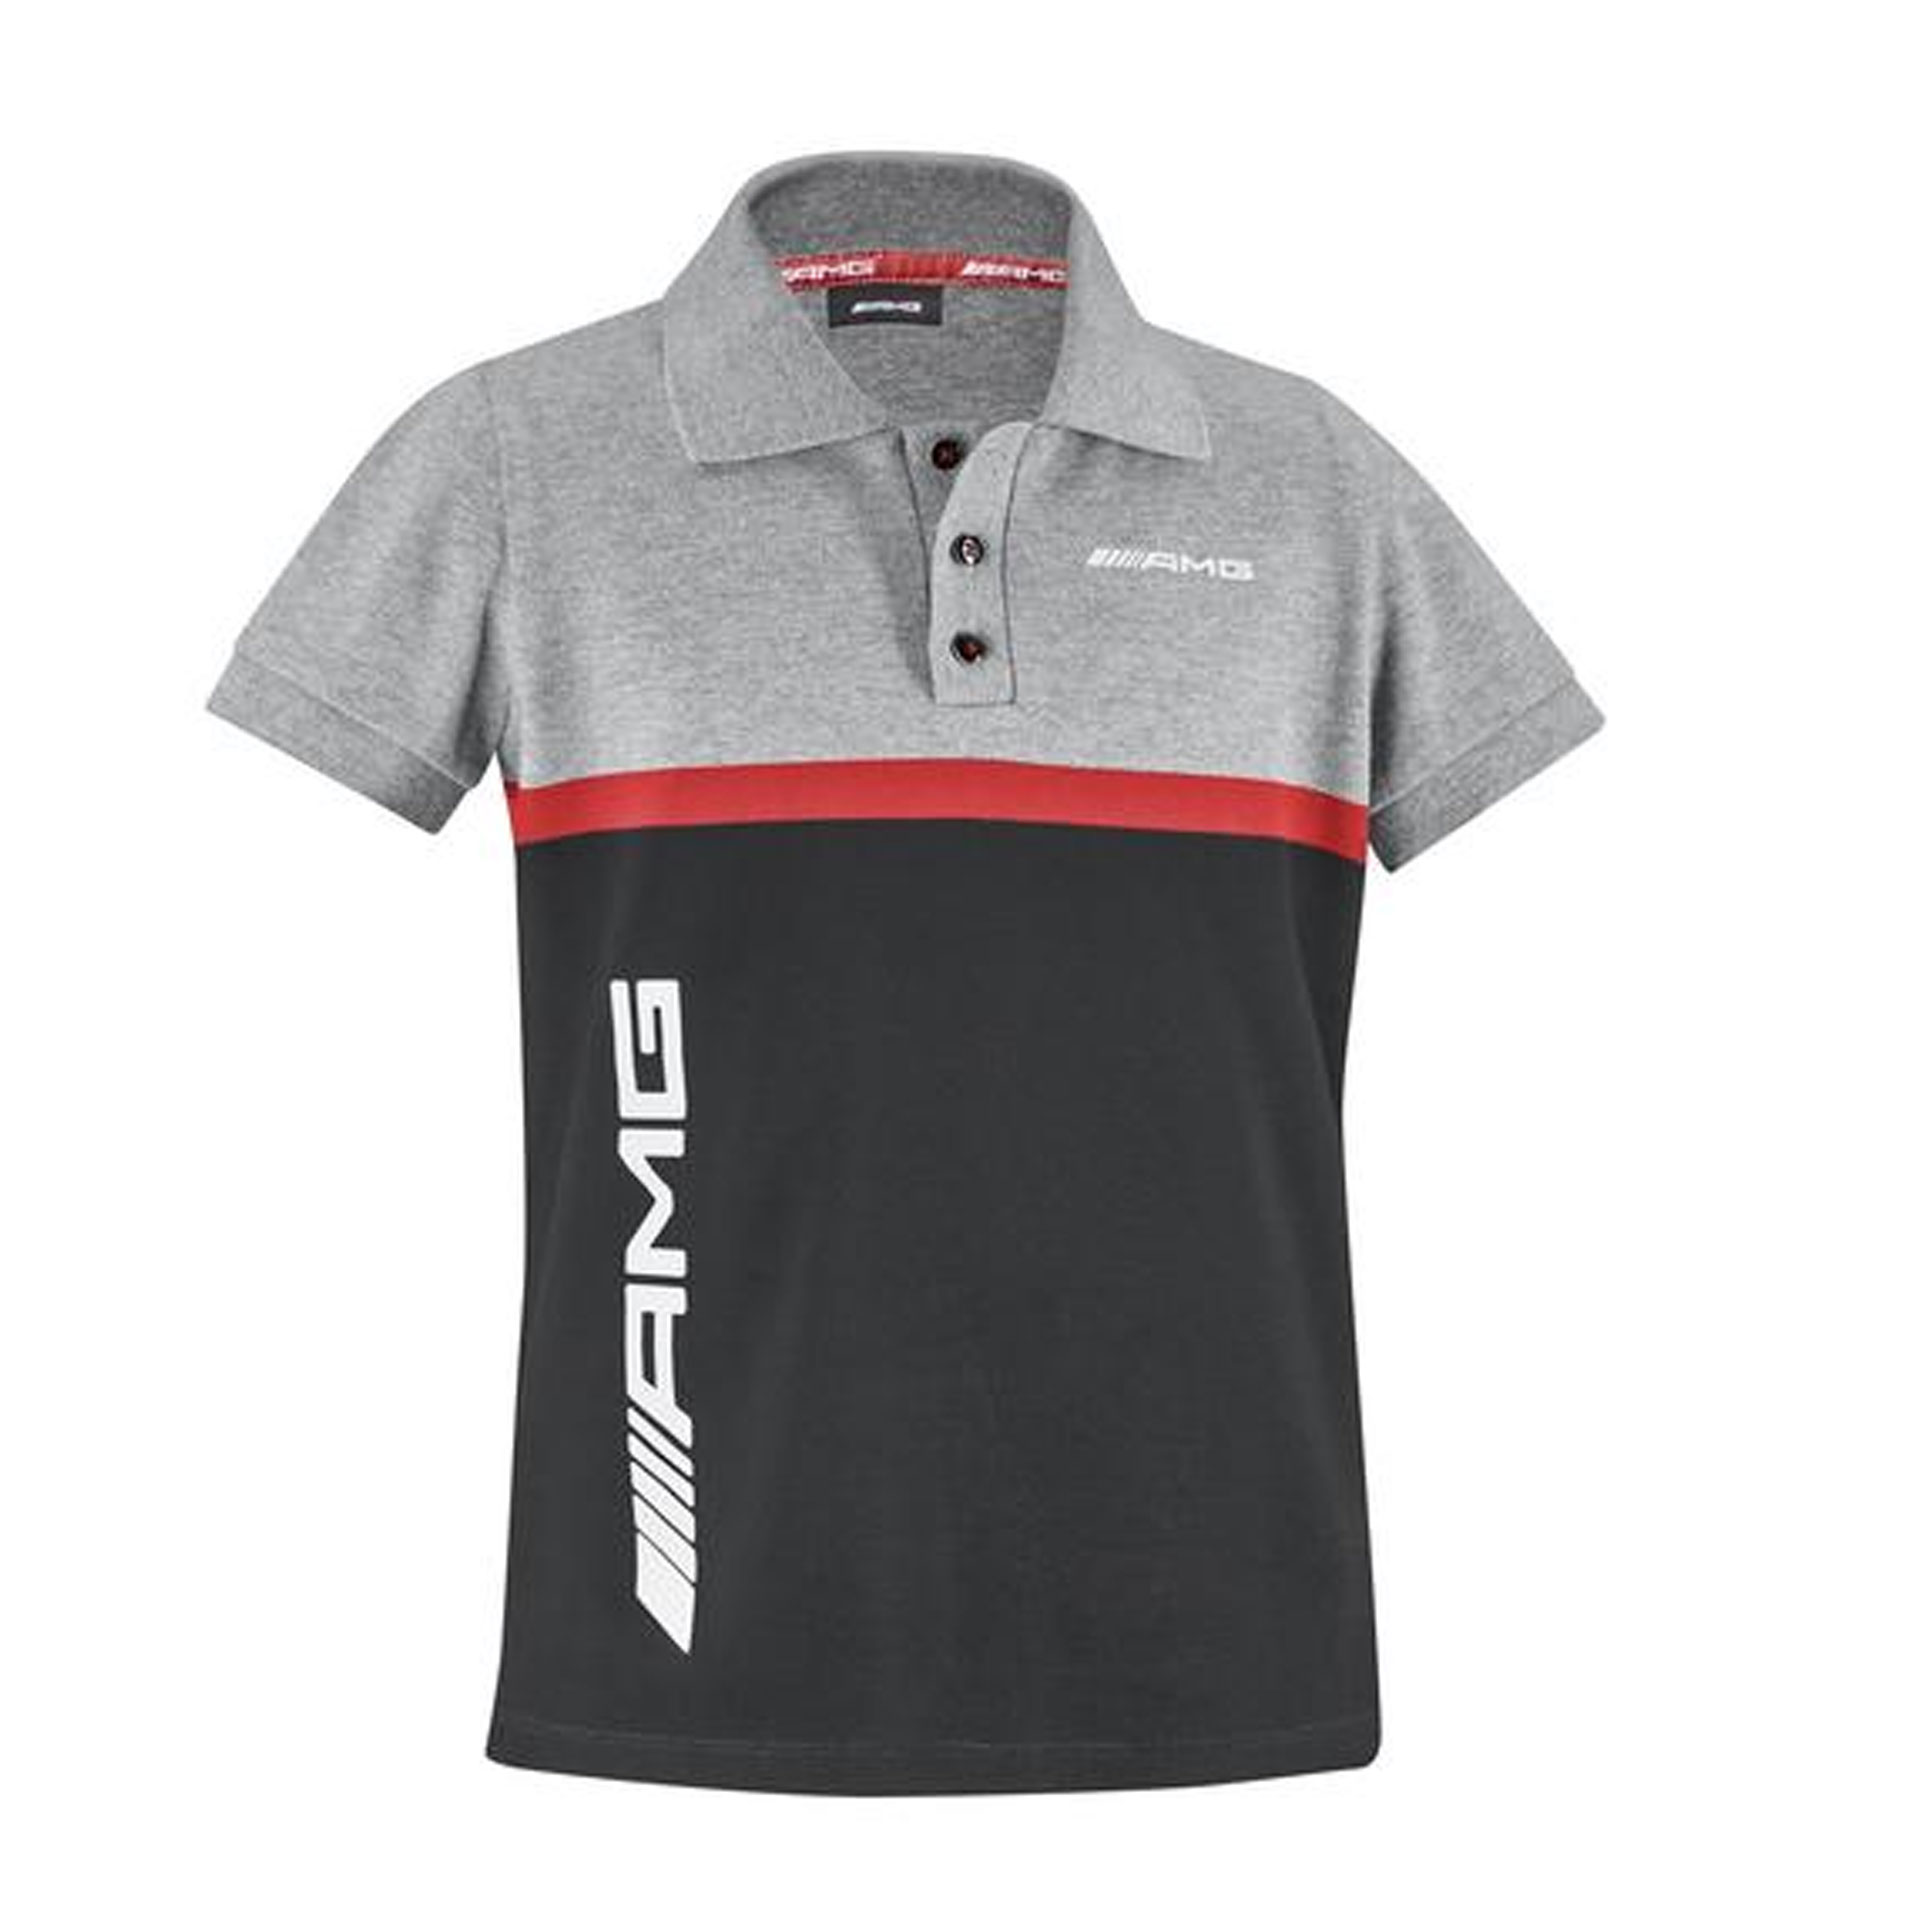 Mercedes-AMG Poloshirt Kinder grau schwarz rot